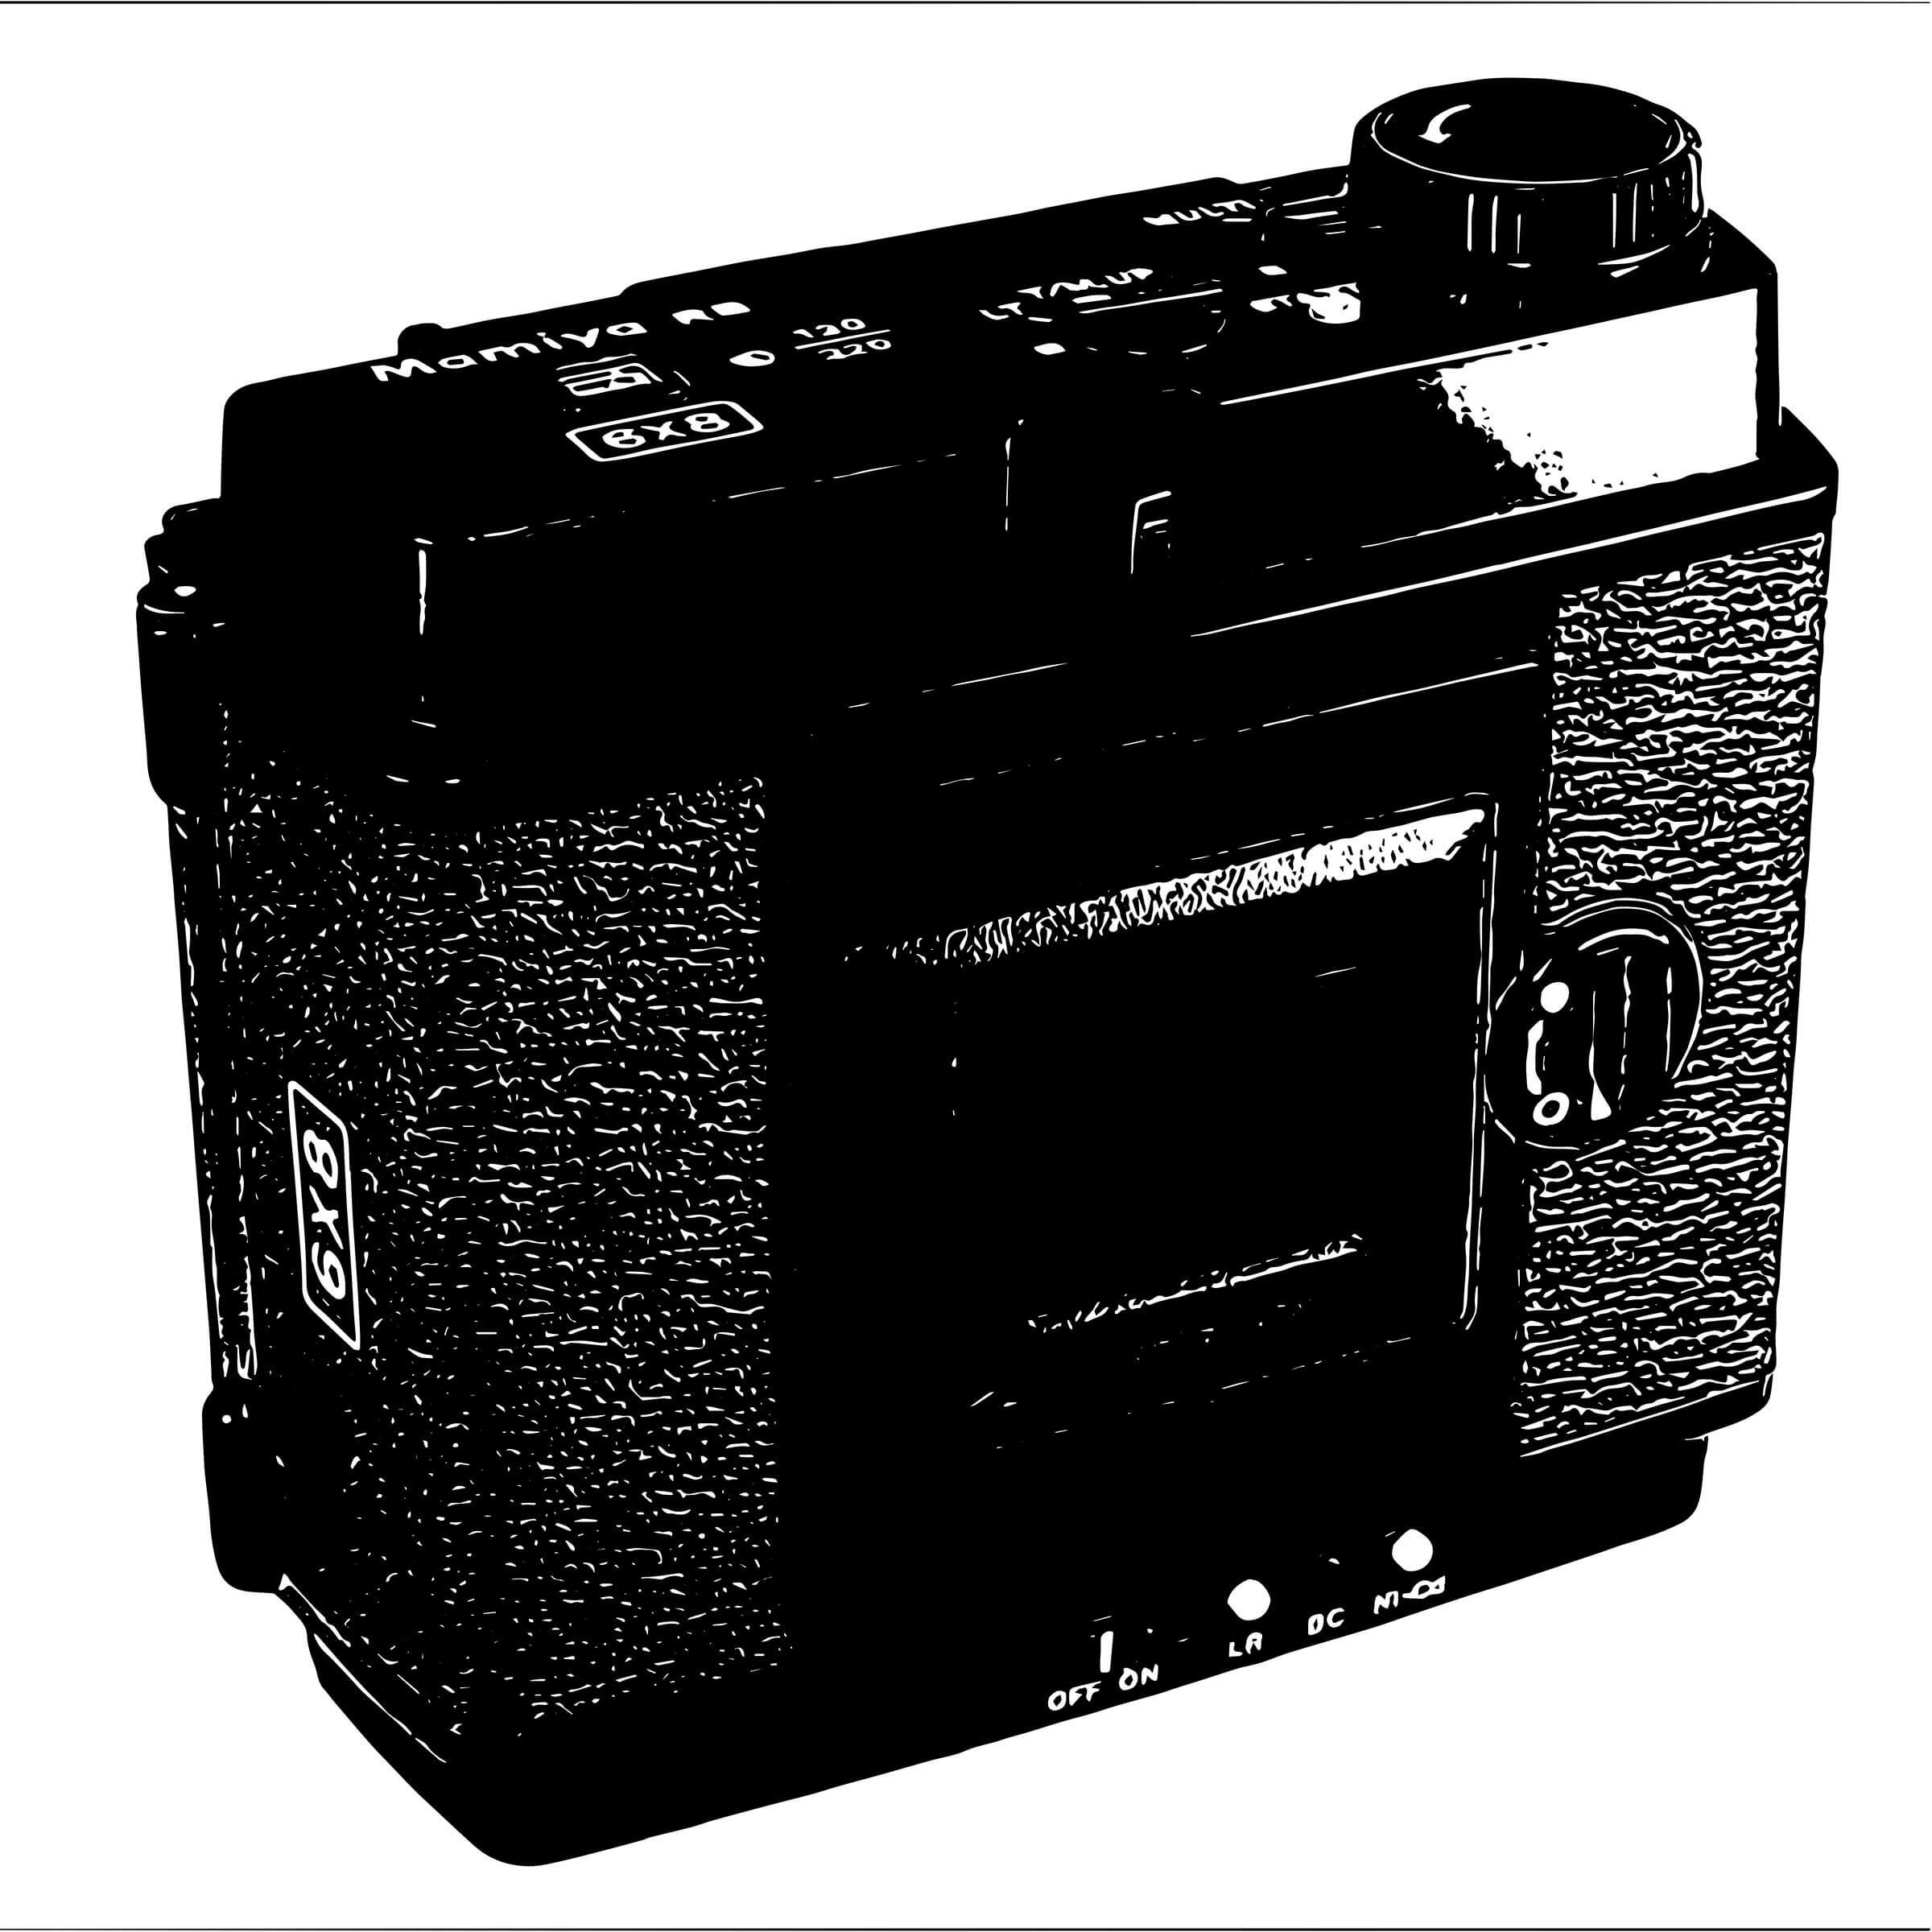 RB67 Pro-S 6x8 Power Drive